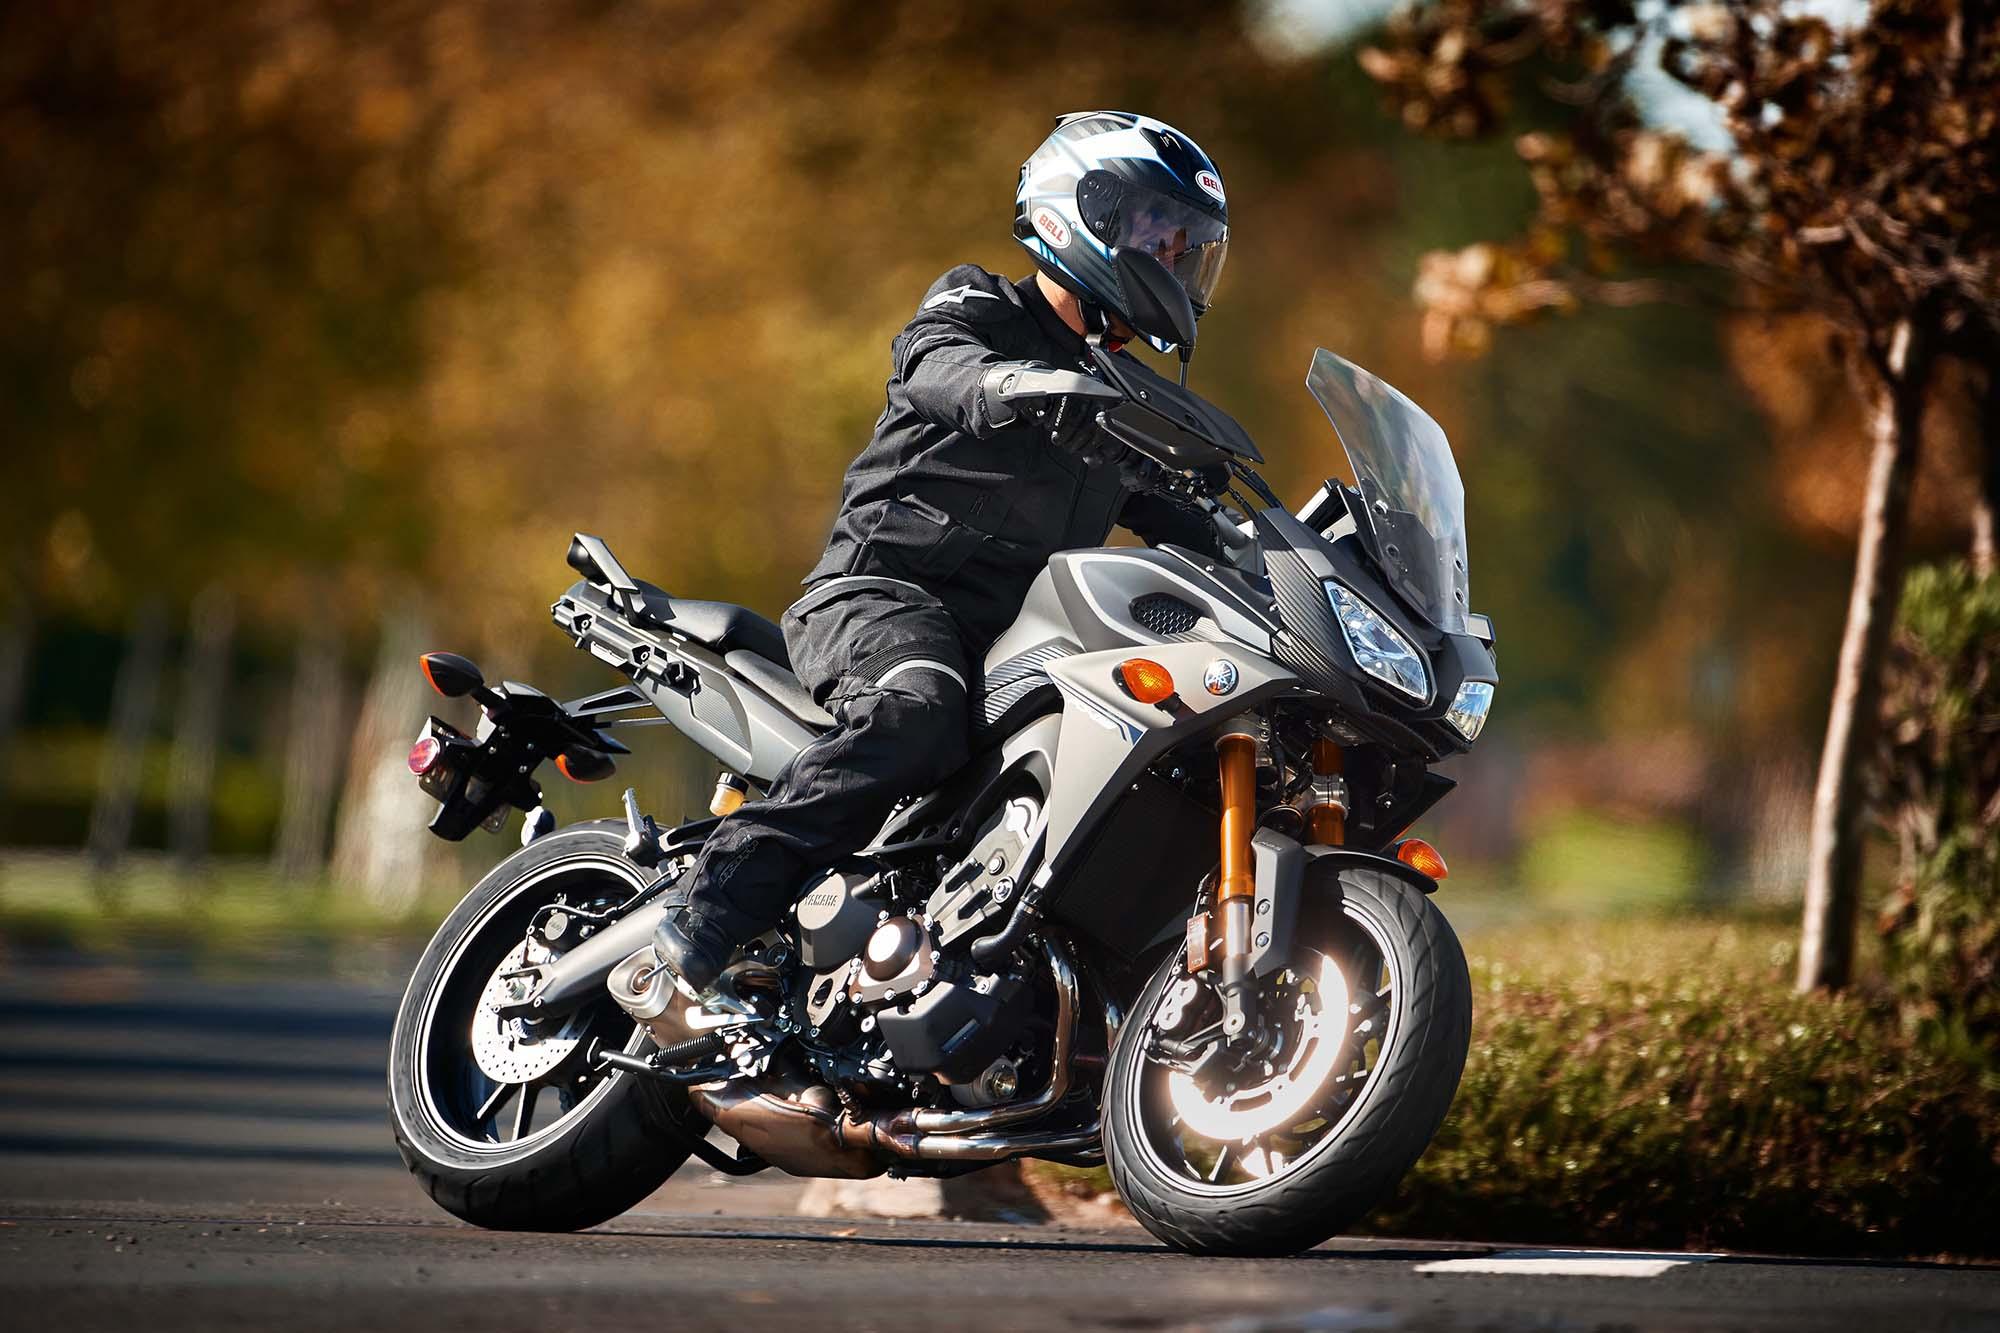 2015 Yamaha Fj 09 Three Cylinders Of Budget Touring